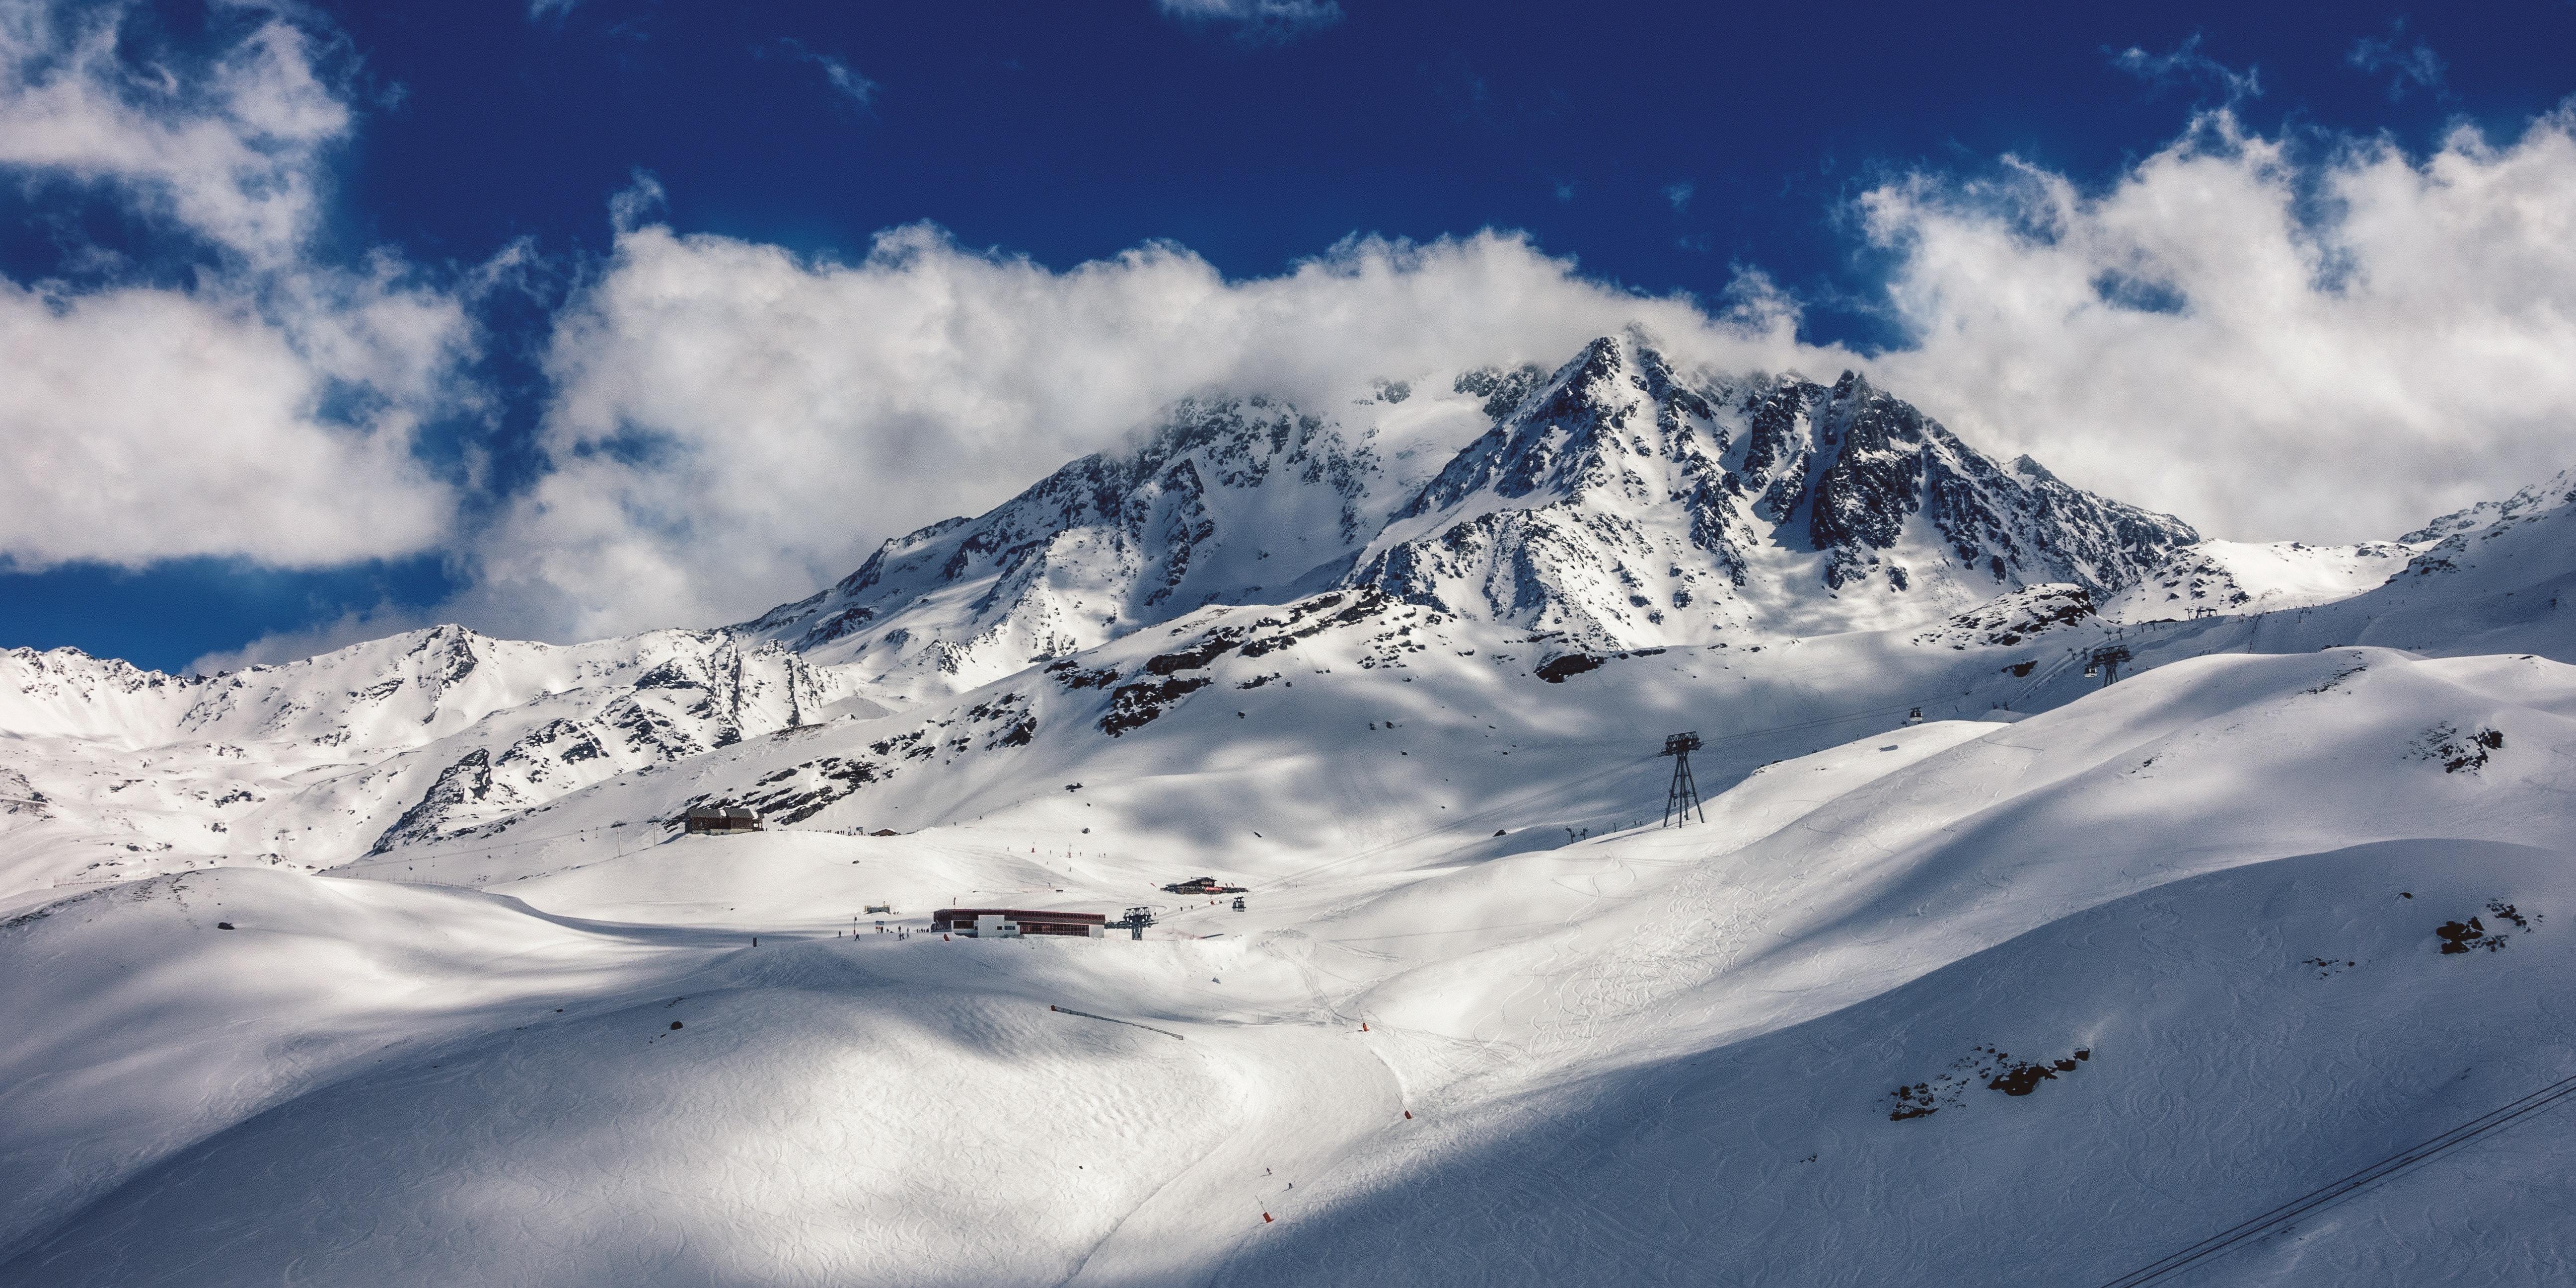 Snow cap mountain photo